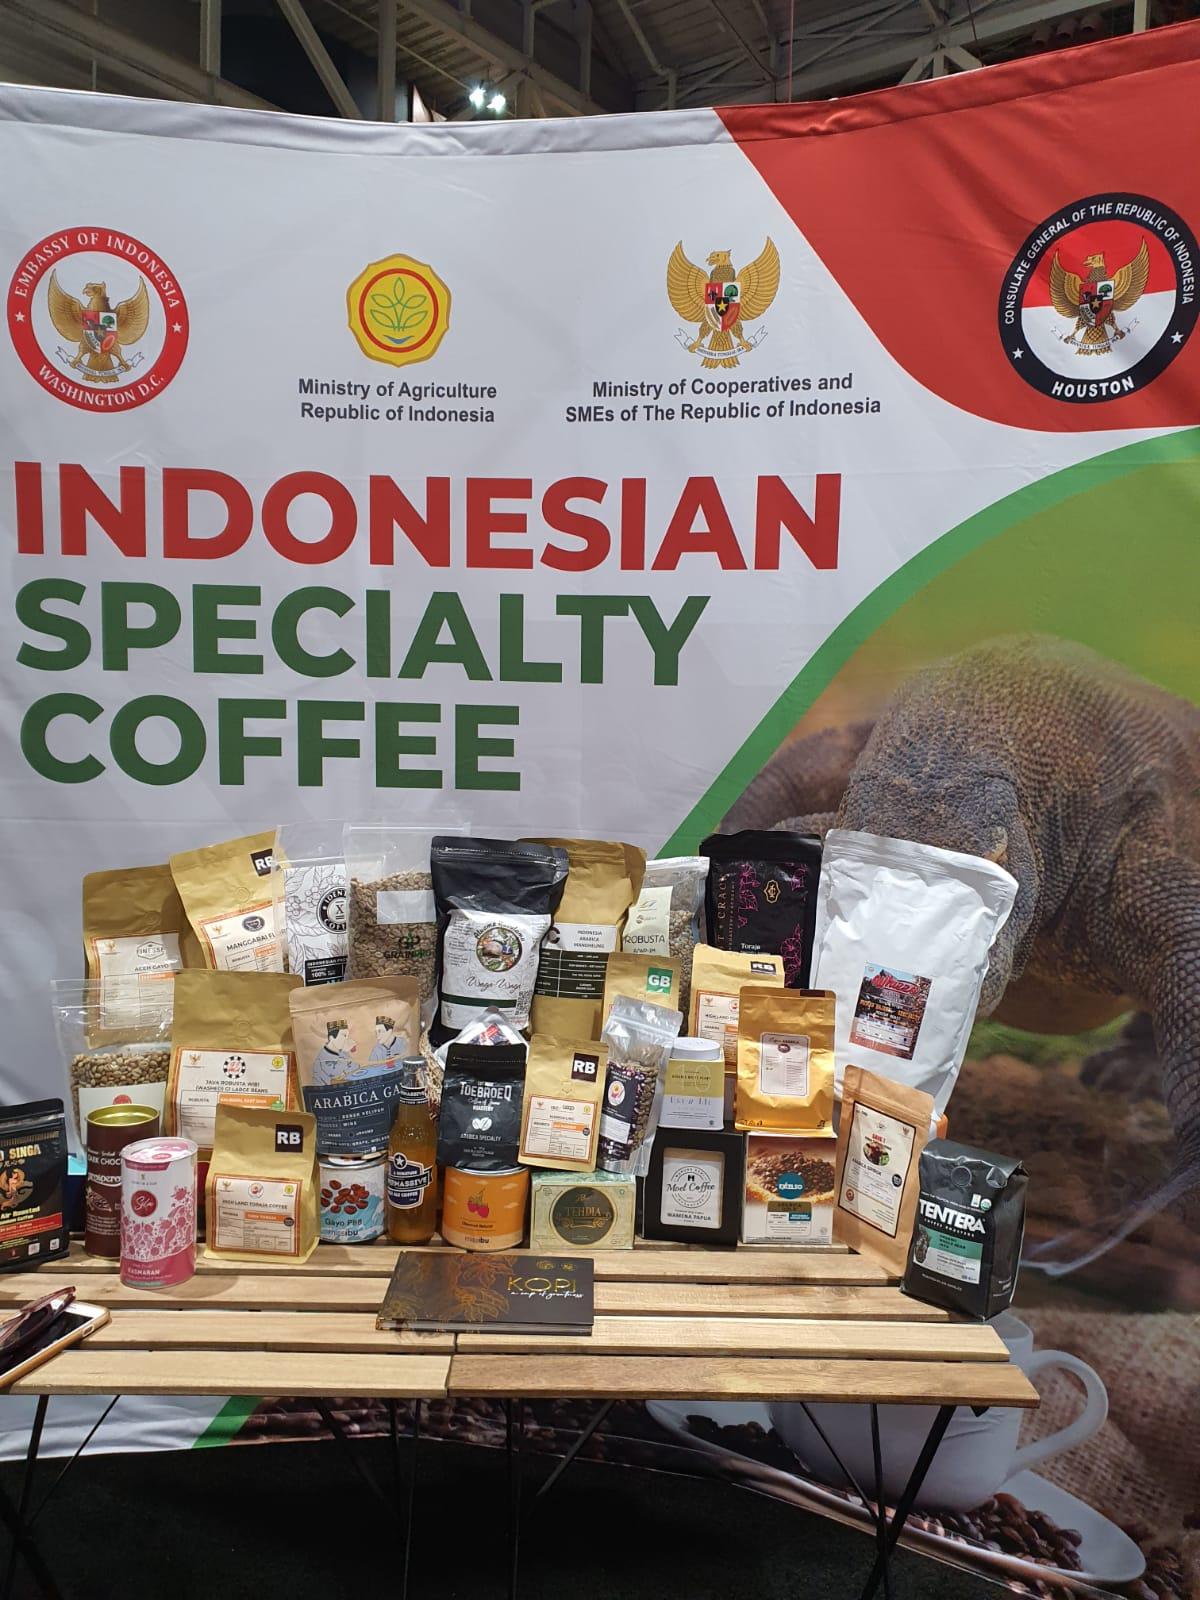 https: img.okezone.com content 2021 10 04 455 2480786 kopi-khas-indonesia-siap-tembus-pasar-amerika-2cMmdgMbwL.jpg